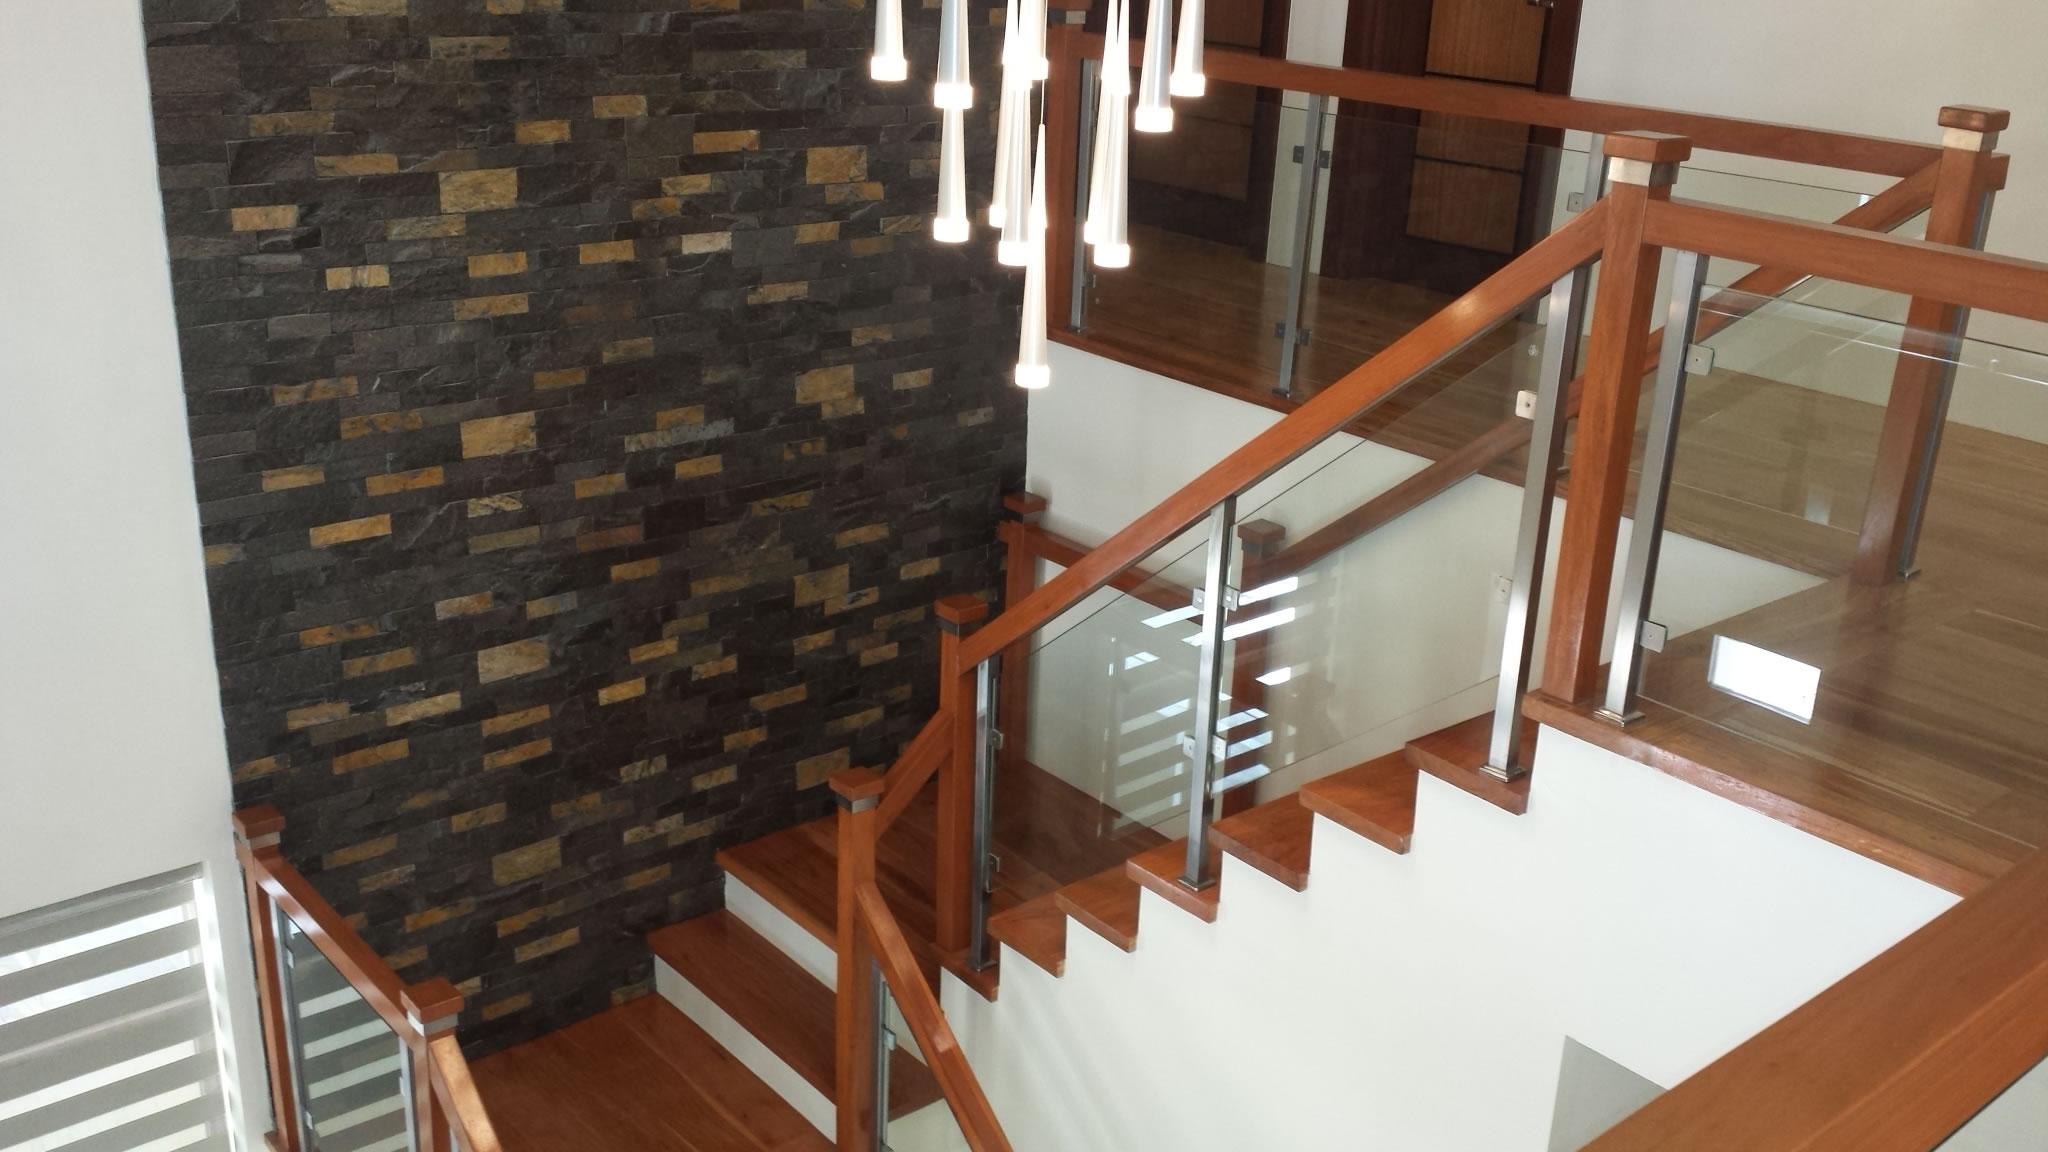 glass-stair-railing-classic-contemporary-design